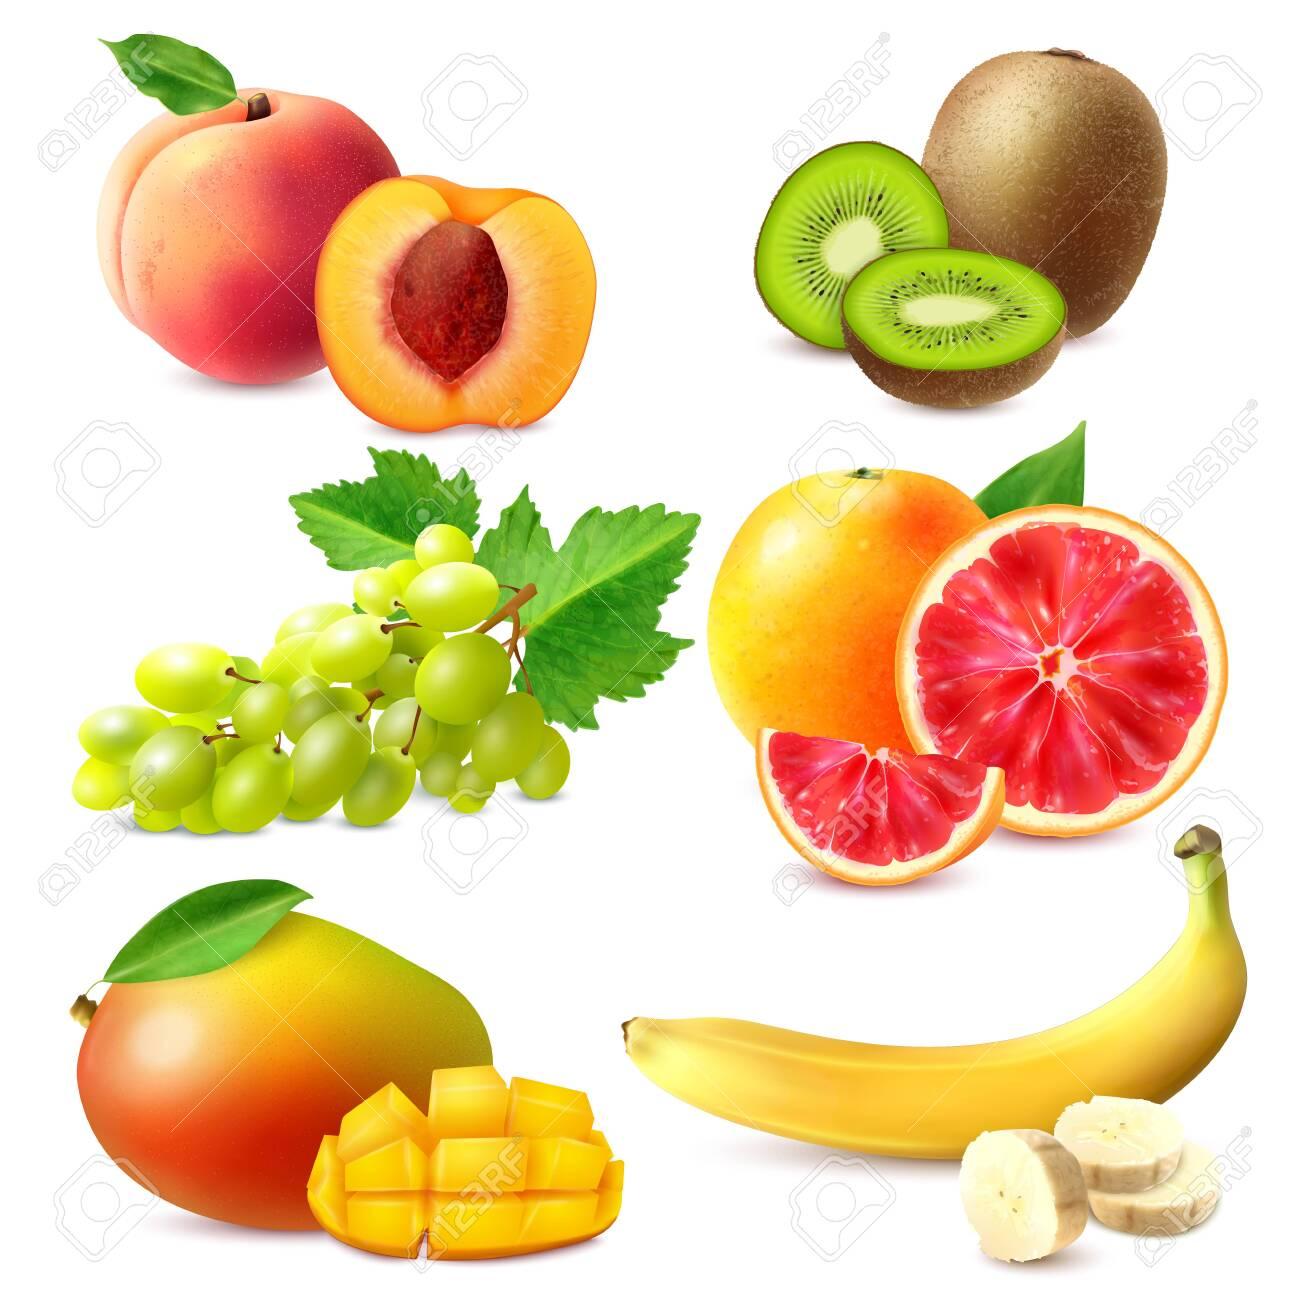 Realistic fruits set with whole and sliced ripe banana mango kiwi grapefruit grapes peach isolated vector illustration - 133933296